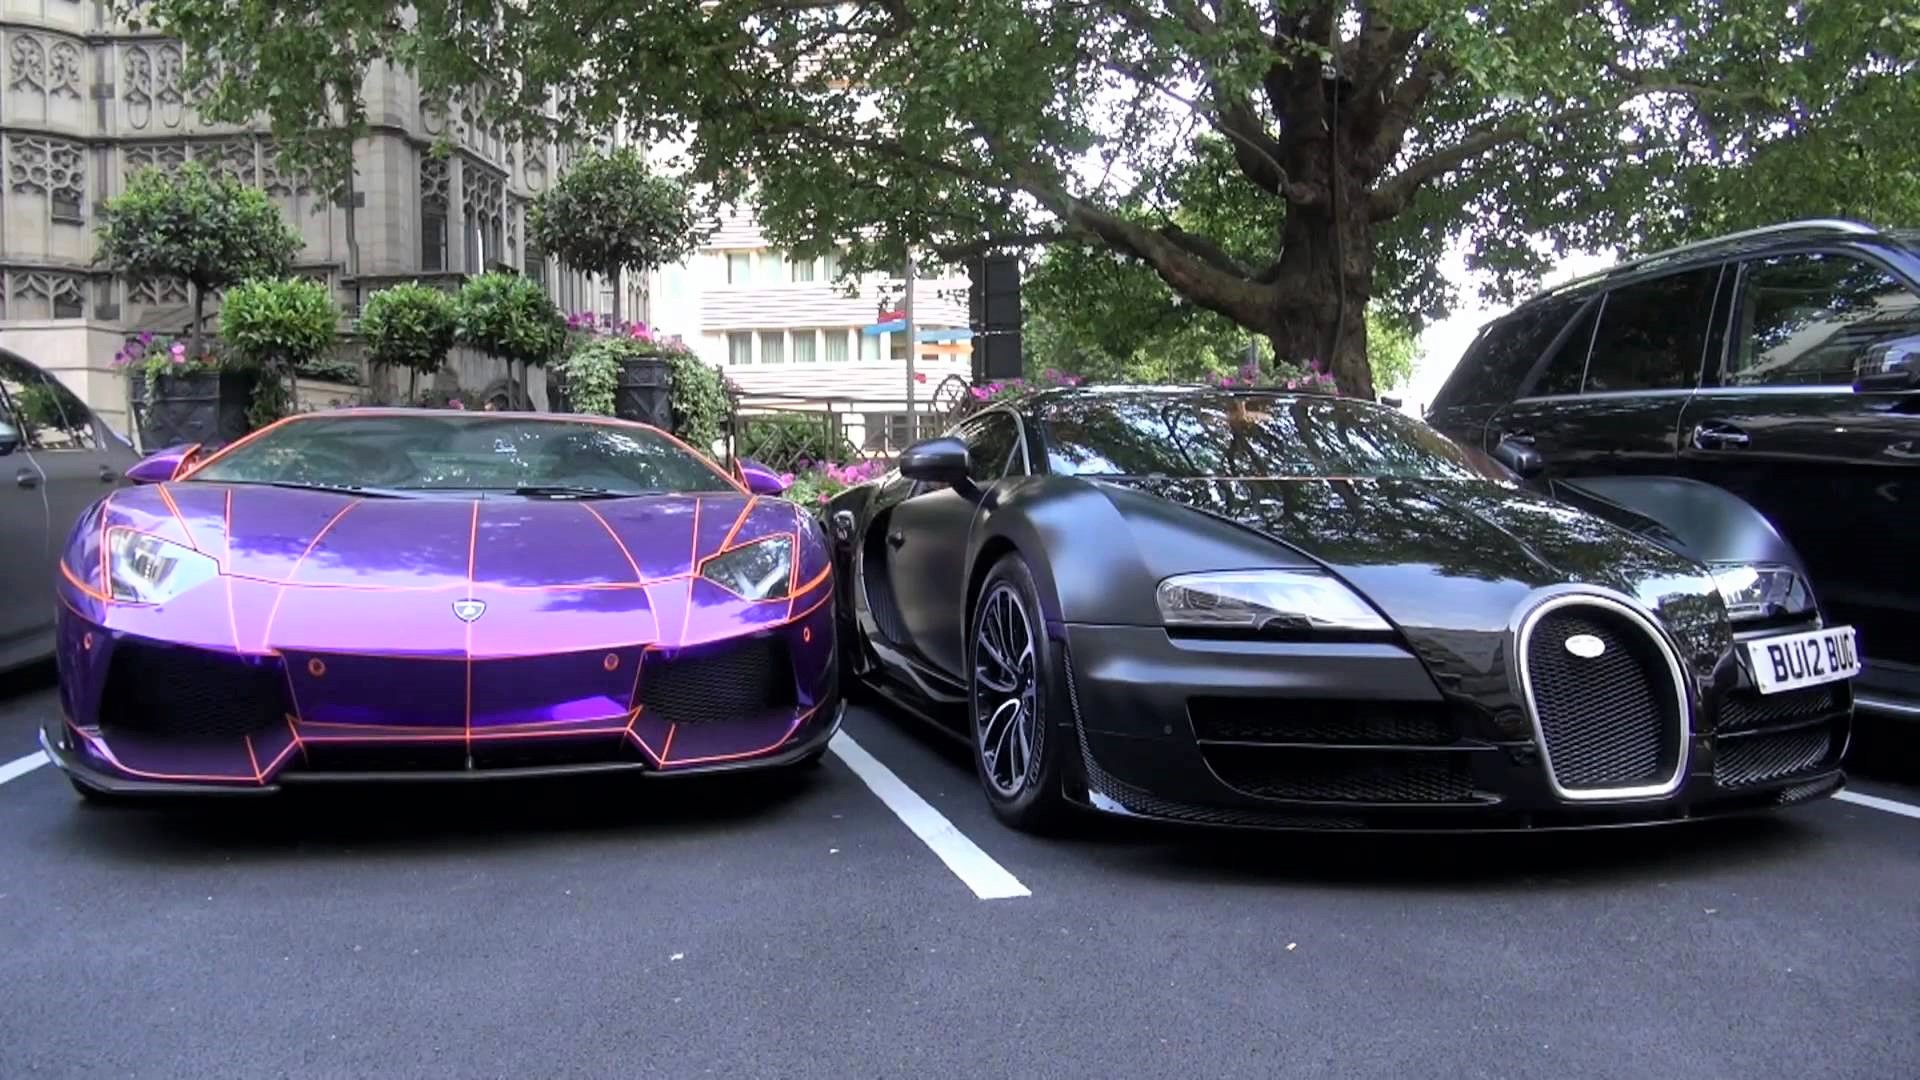 Superautomobili u Londonu